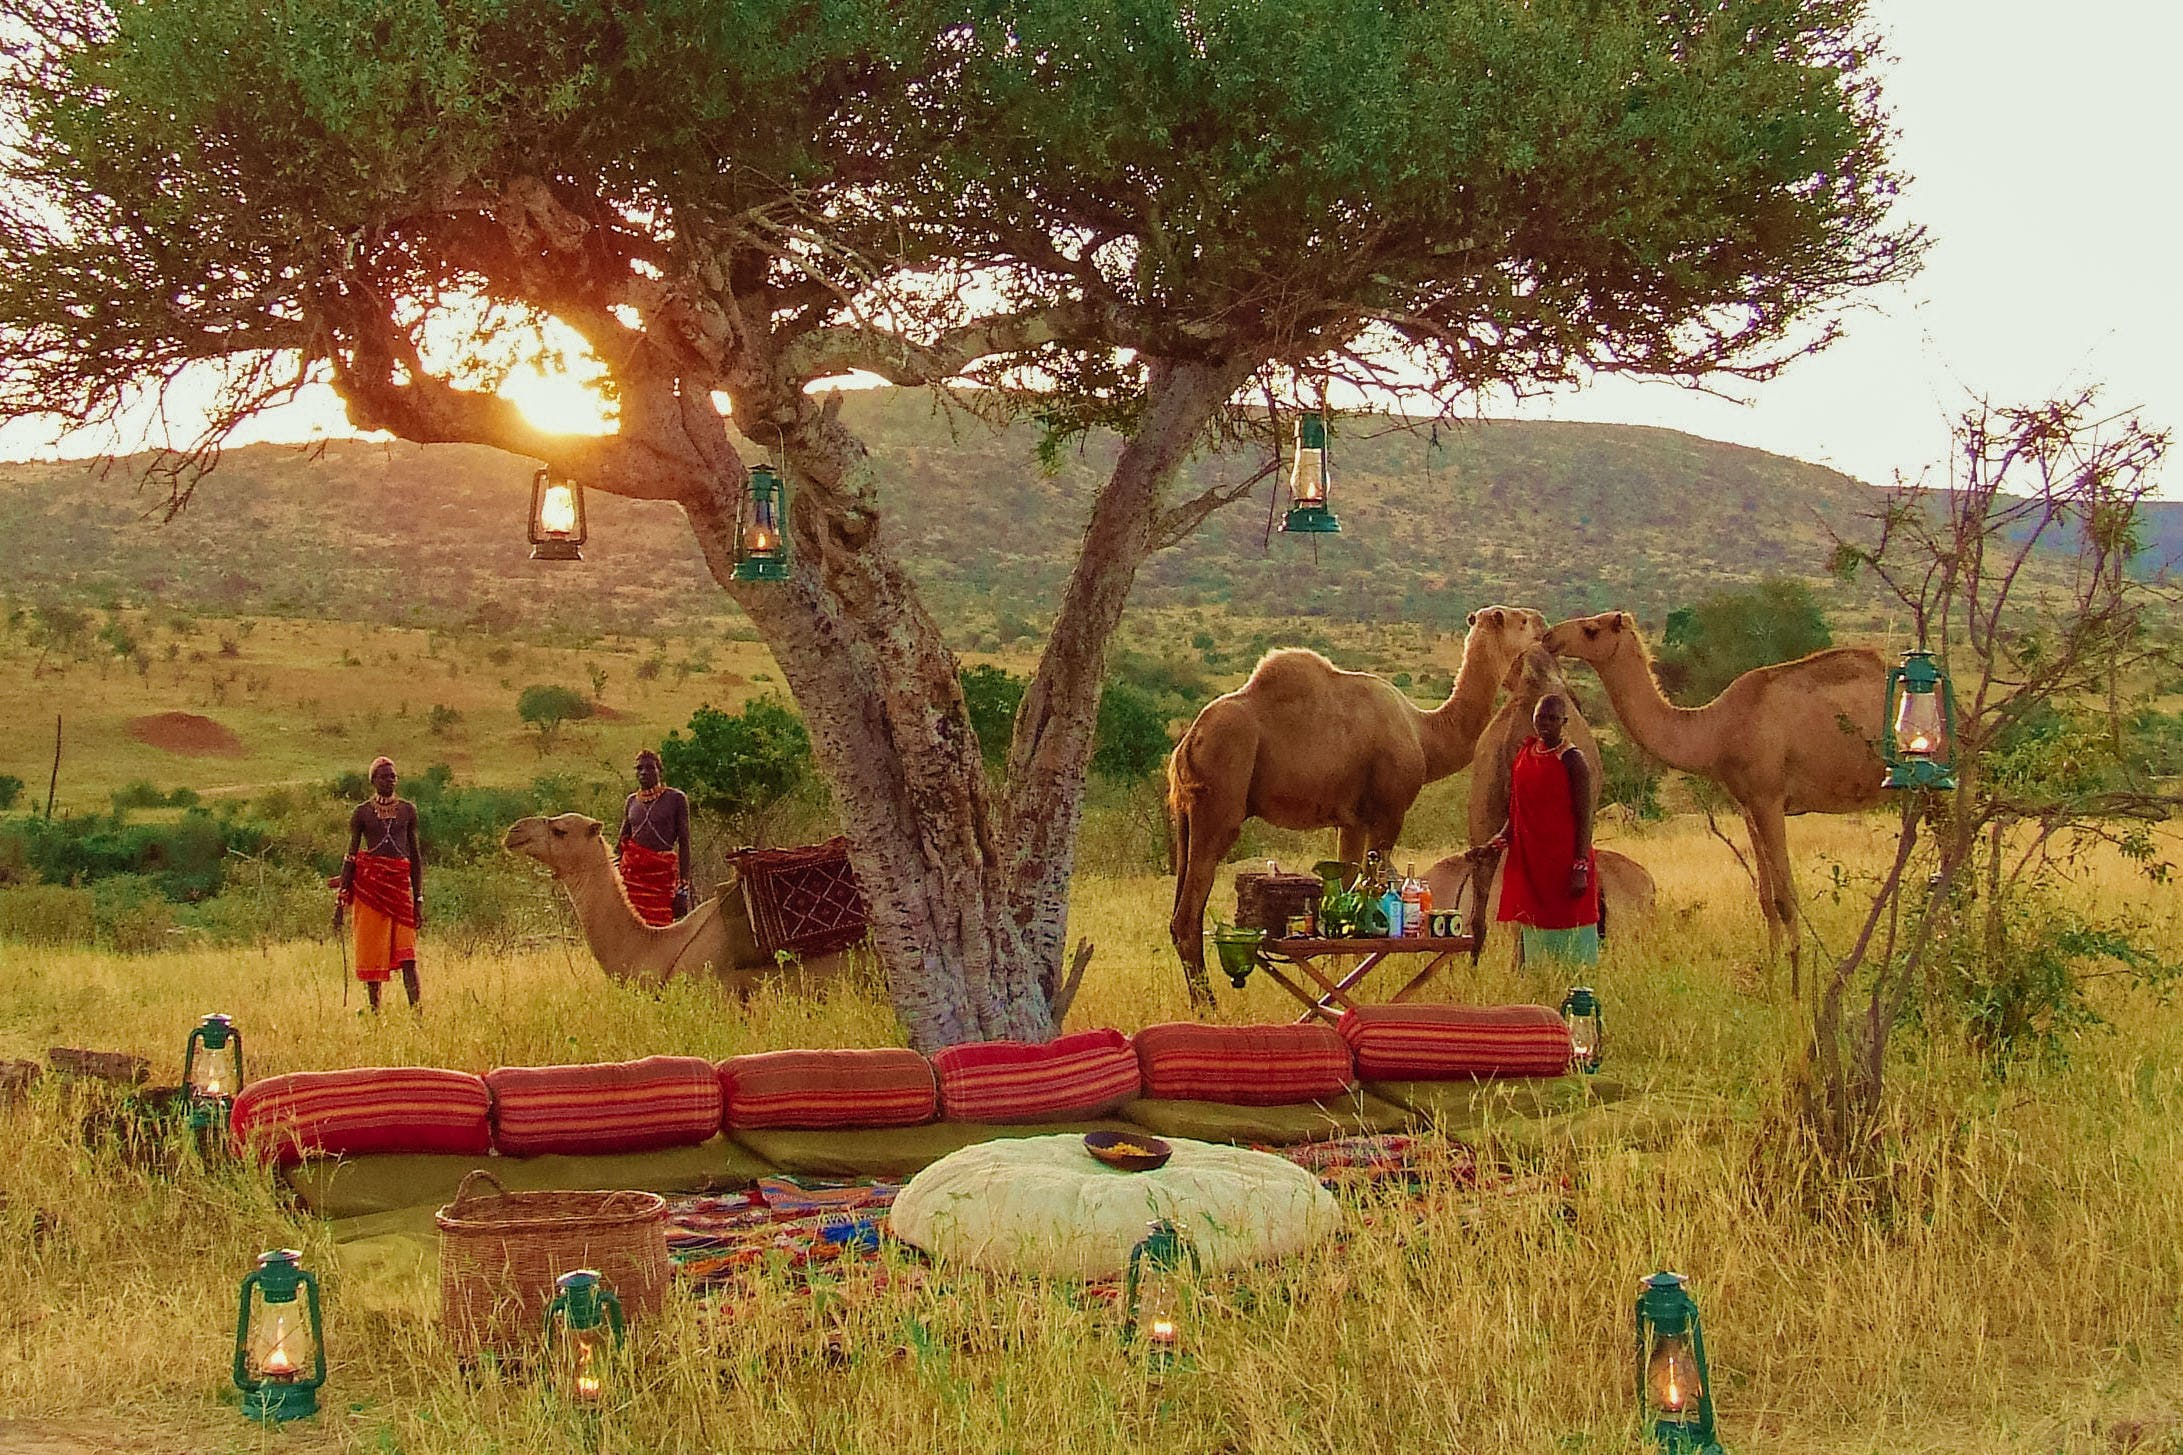 Lemarti Camp, Laikipia, Kenya